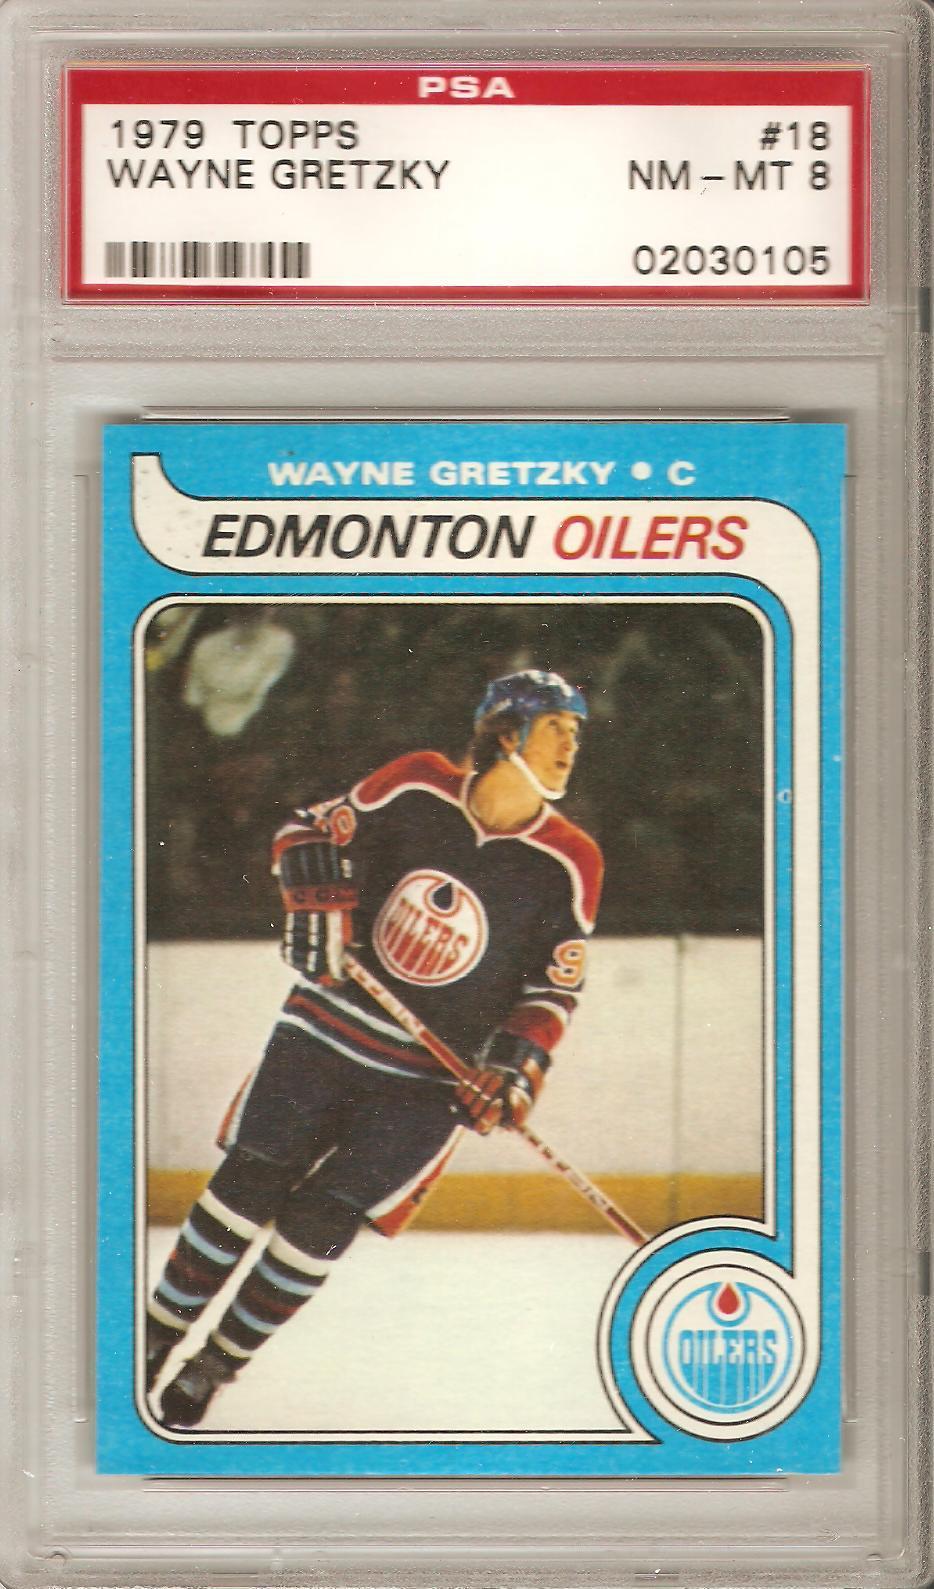 Shoebox Legends Top 60 Hockey Cards Redux Part One